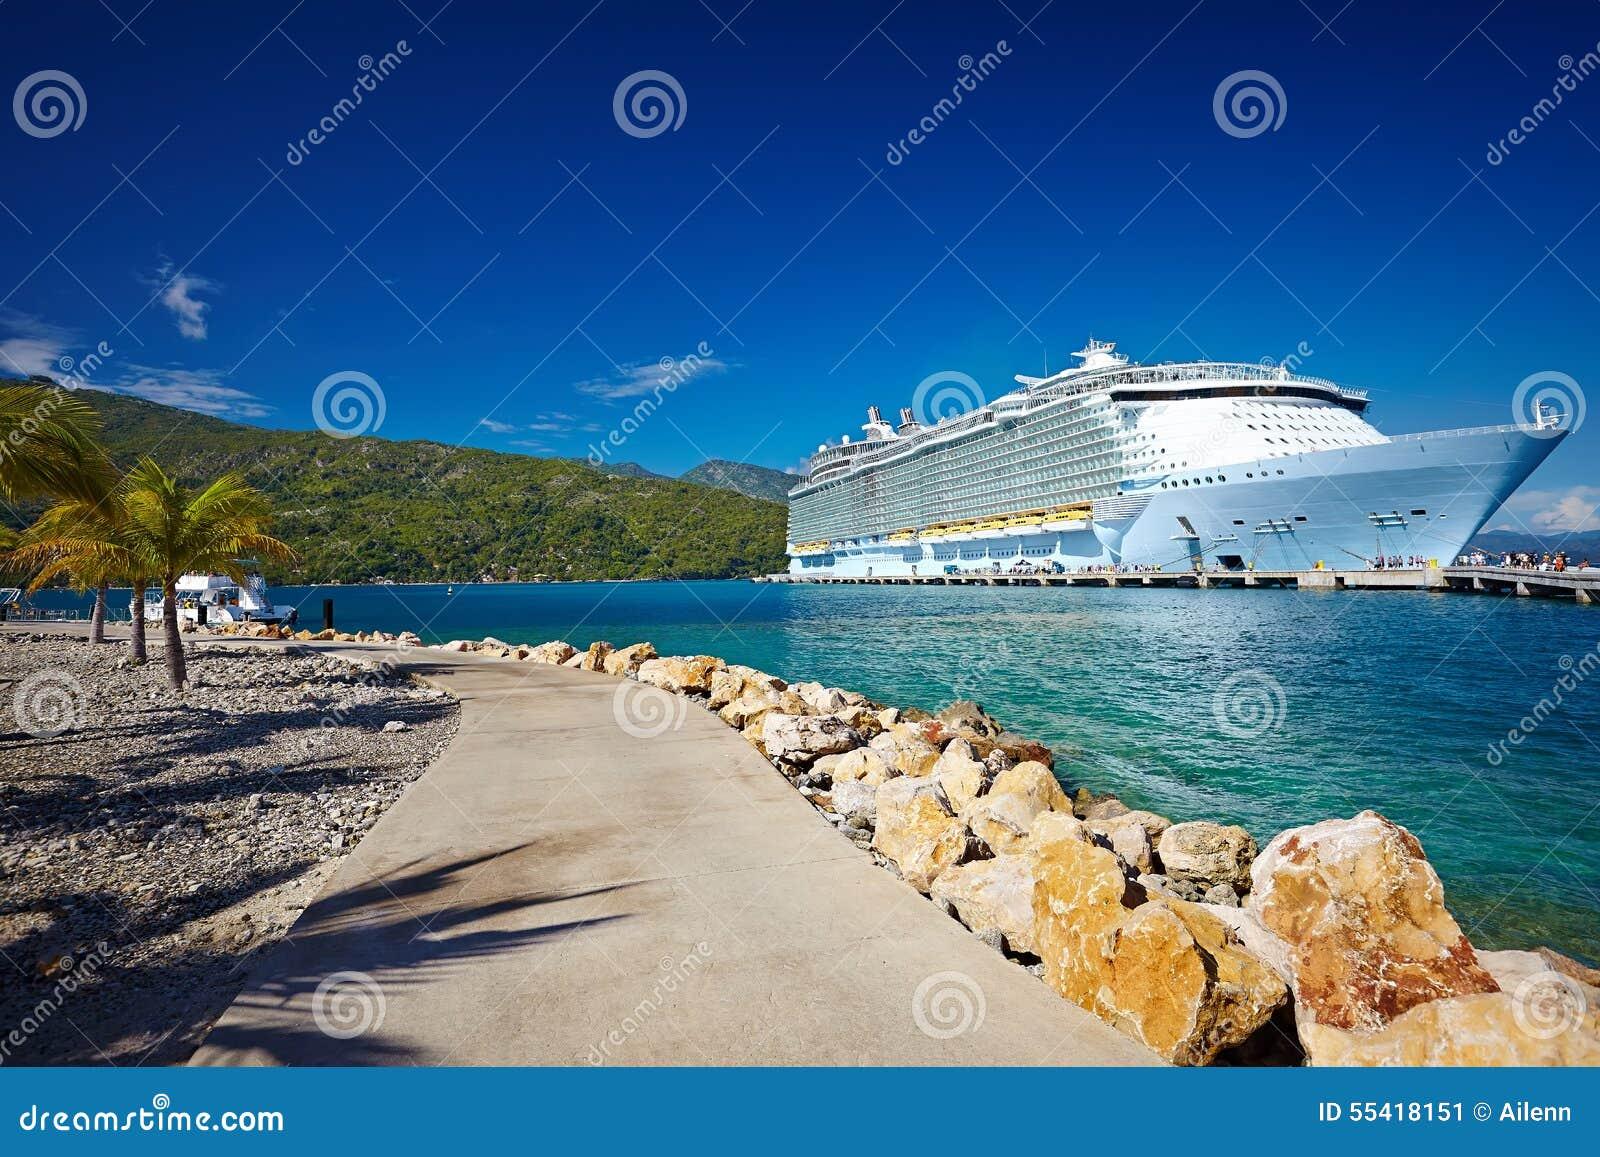 Passagerareeyeliner i det tropiska havet mot blå himmel, Haiti